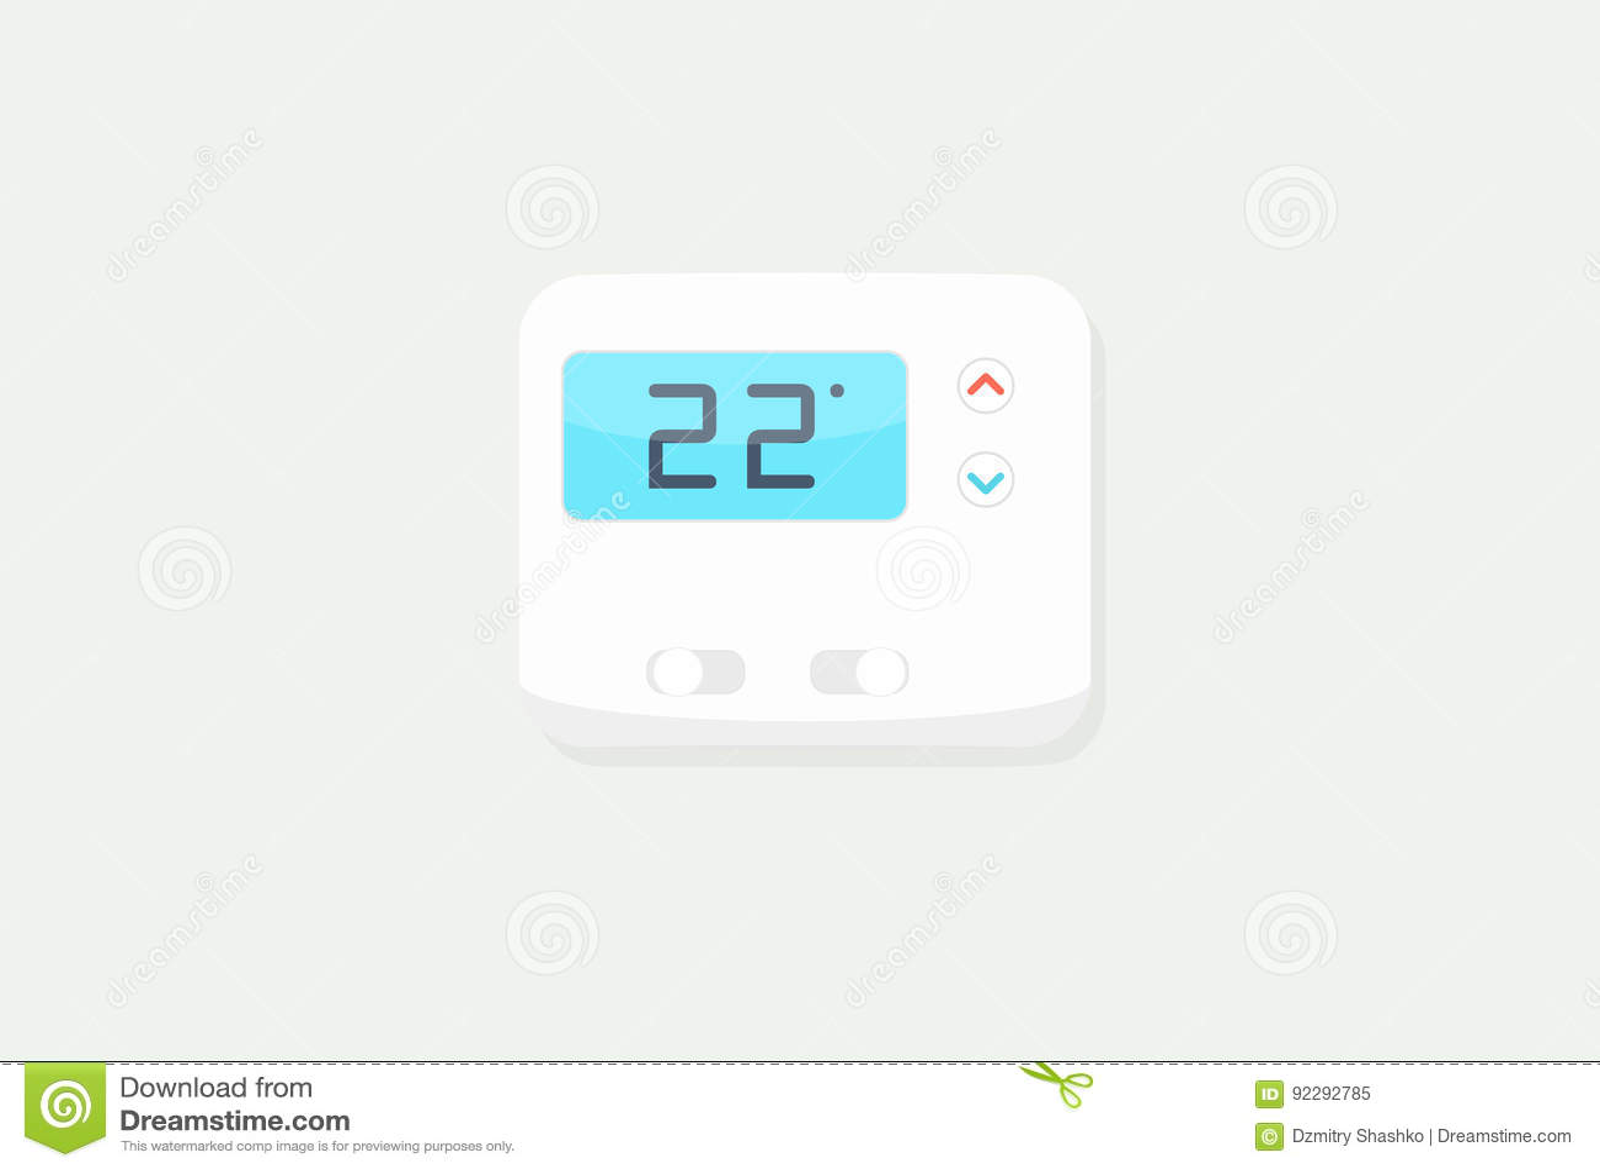 Digital Thermostat On White Background Stock Vector Illustration